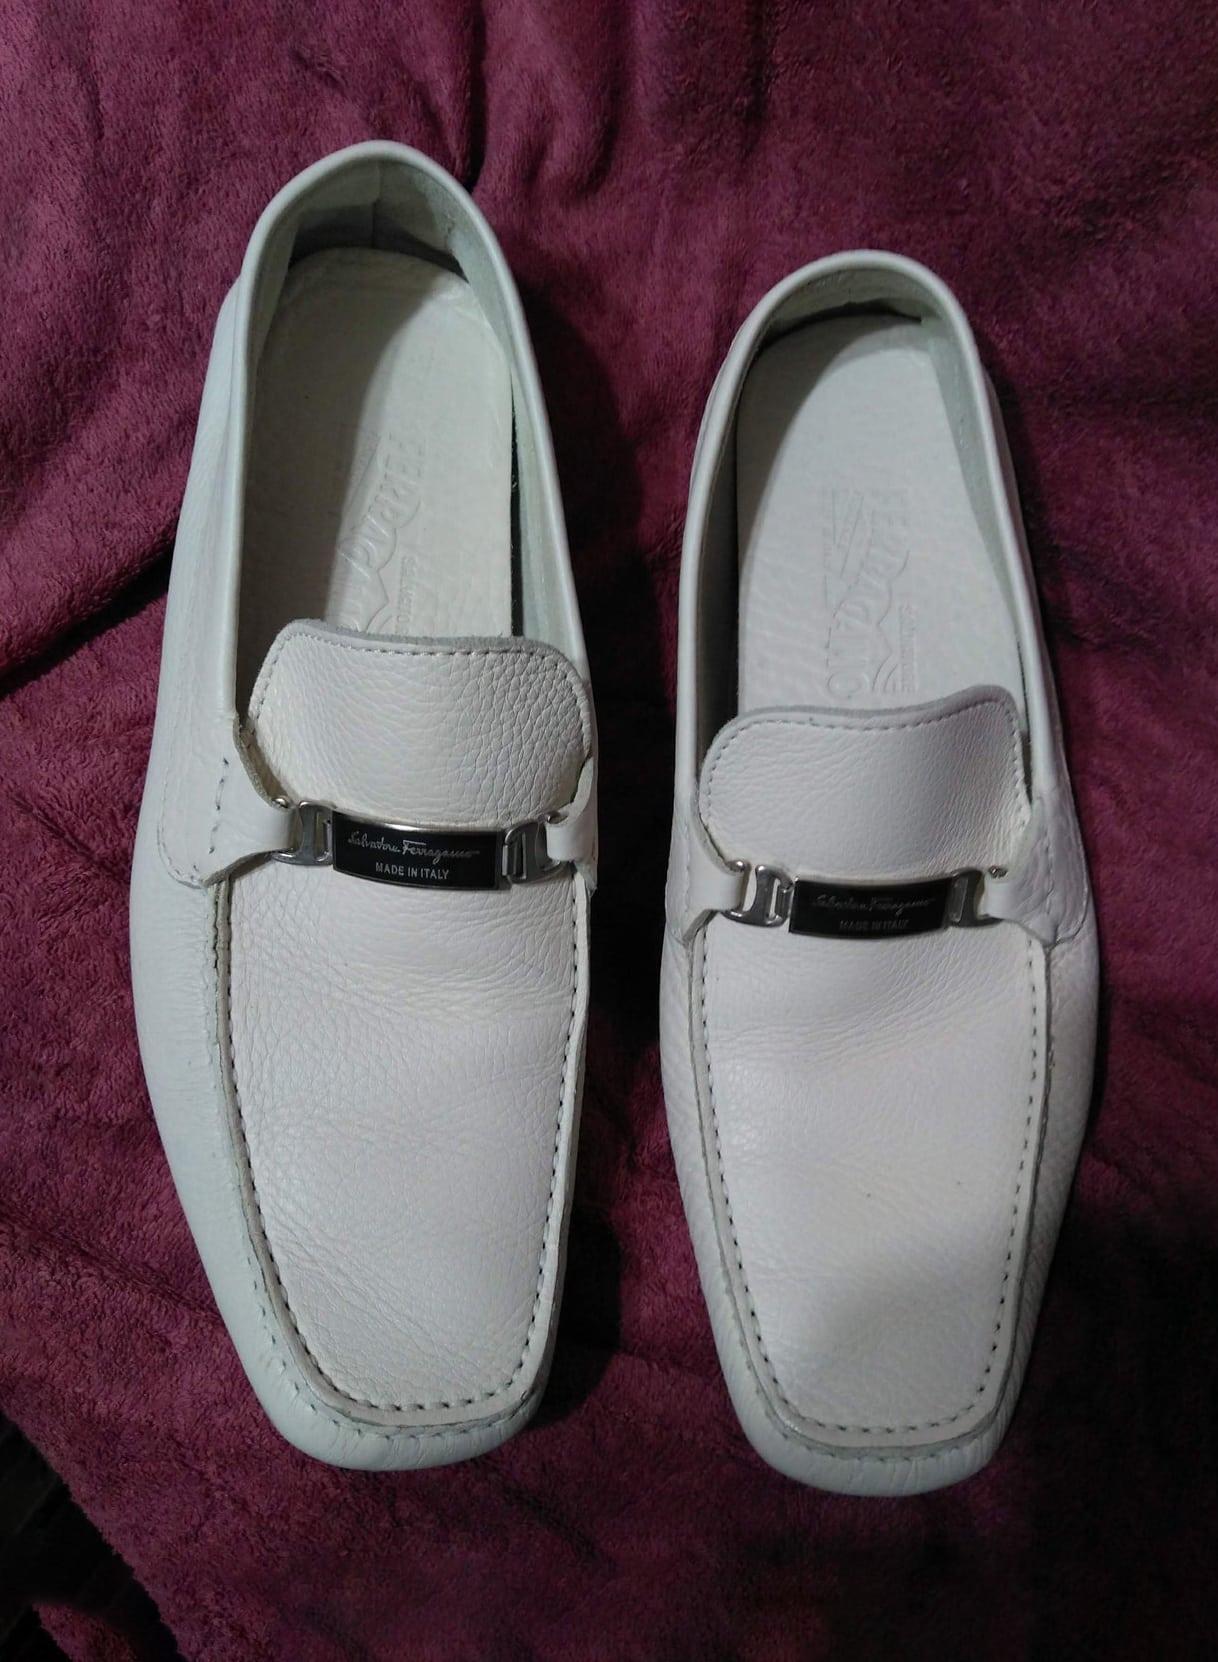 Salvatore Ferragamo mens driving loafers shoes drivers white cream leather 9